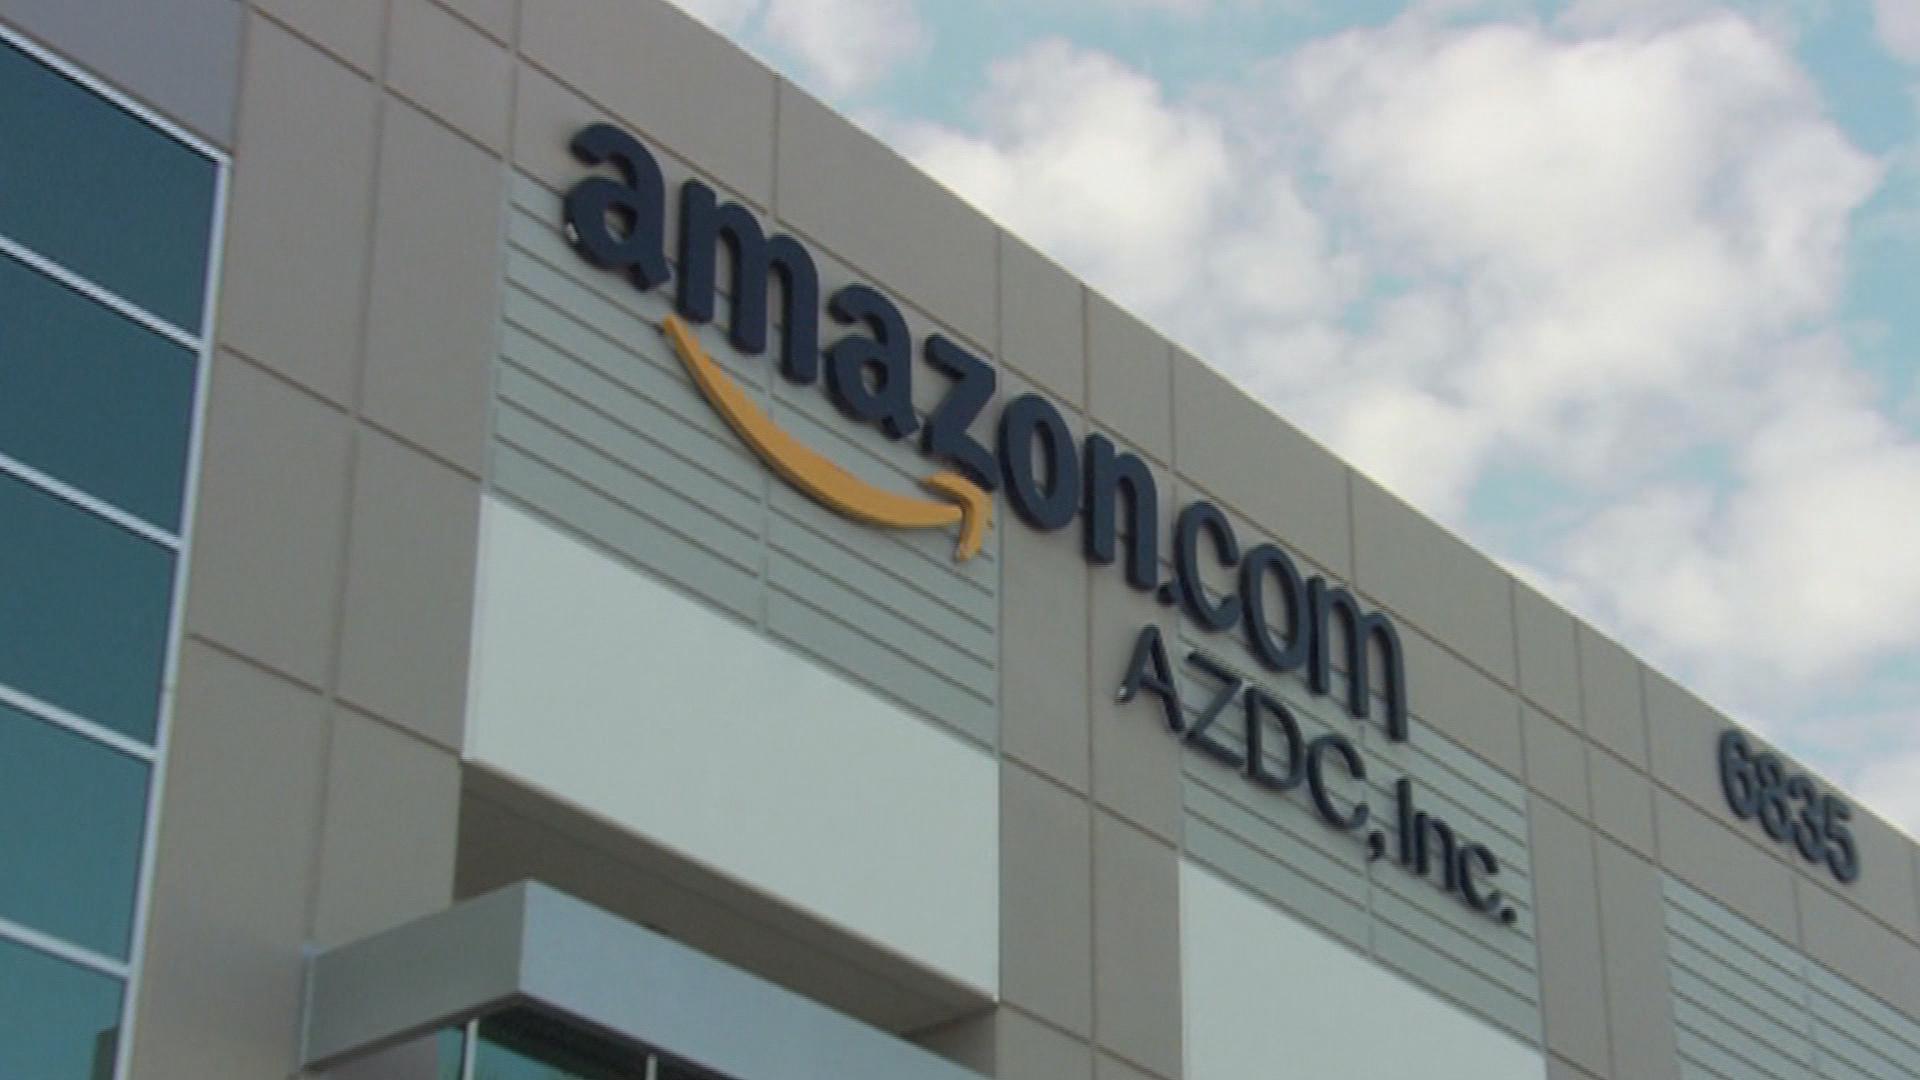 Crain's Headlines: Amazon Adds 400 Jobs to Chicago Office